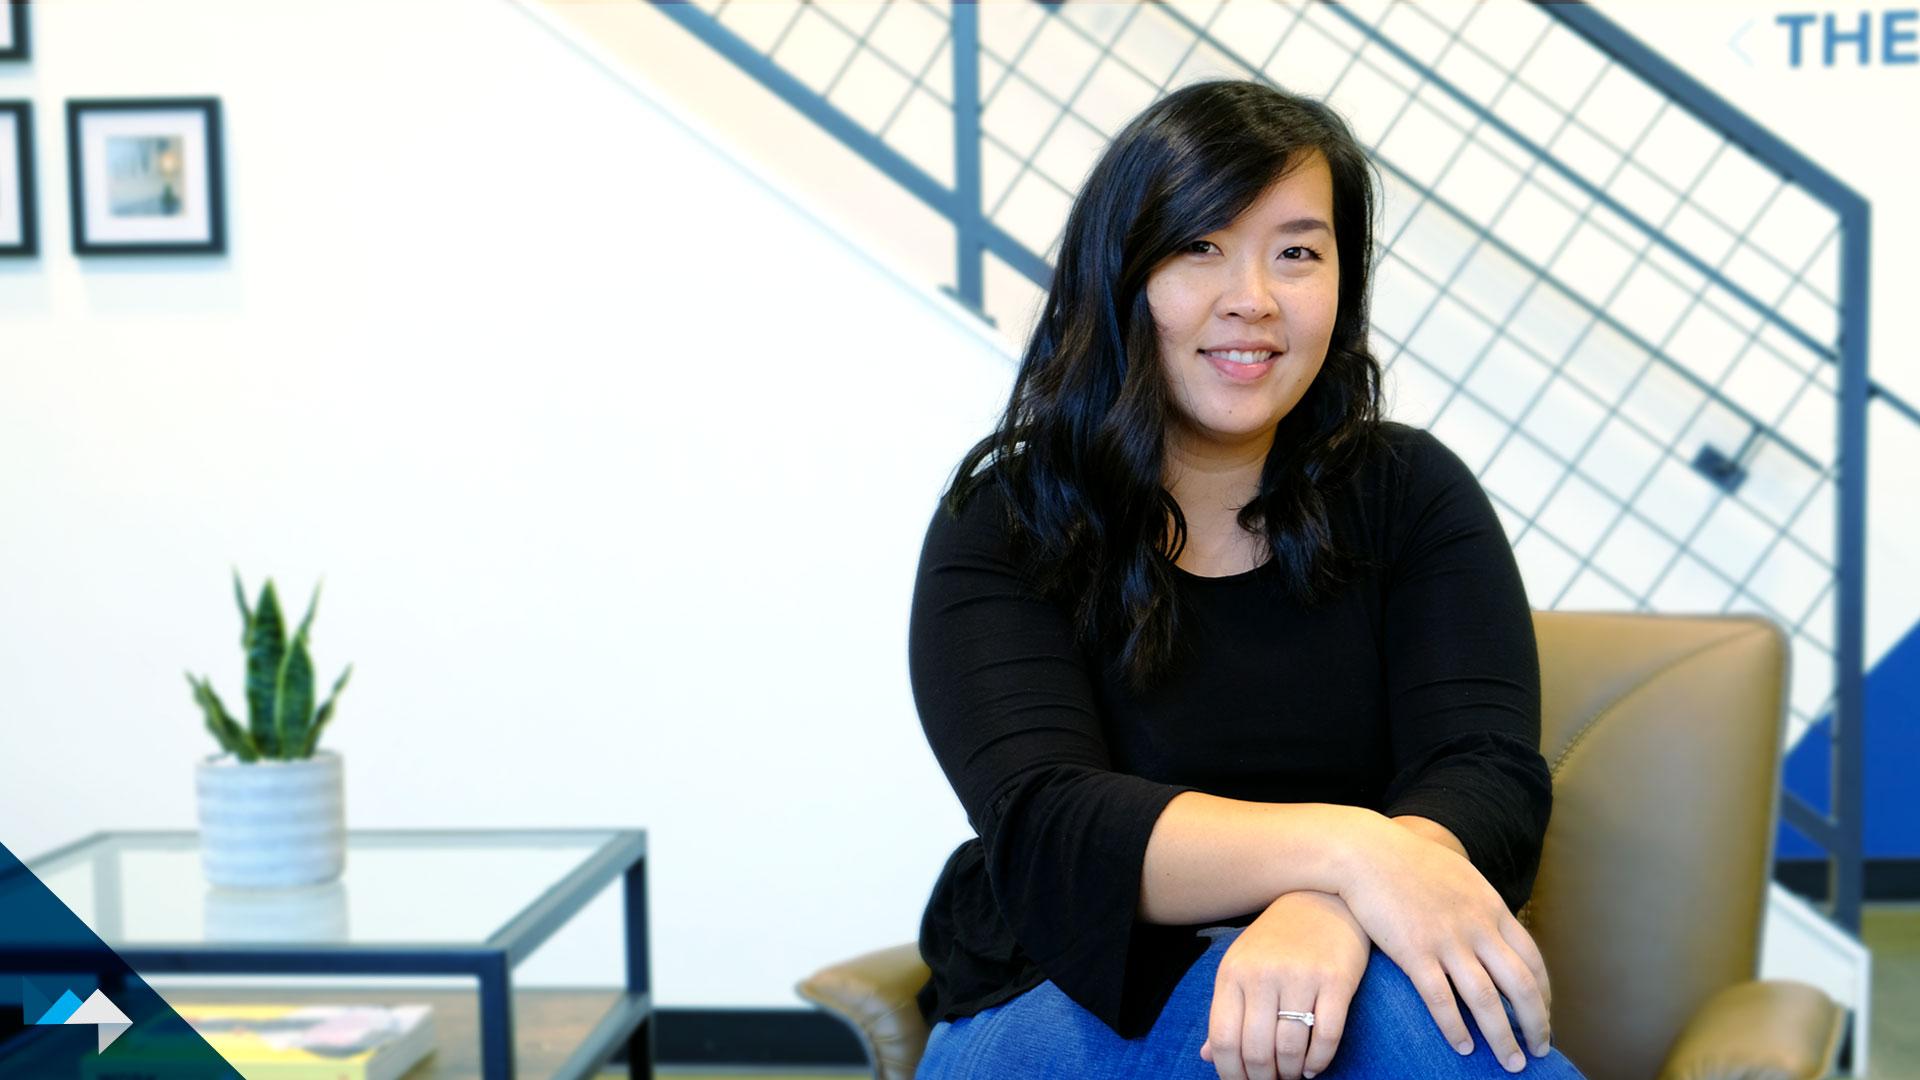 Welcome our new Visual Designer, Jennifer Tu!